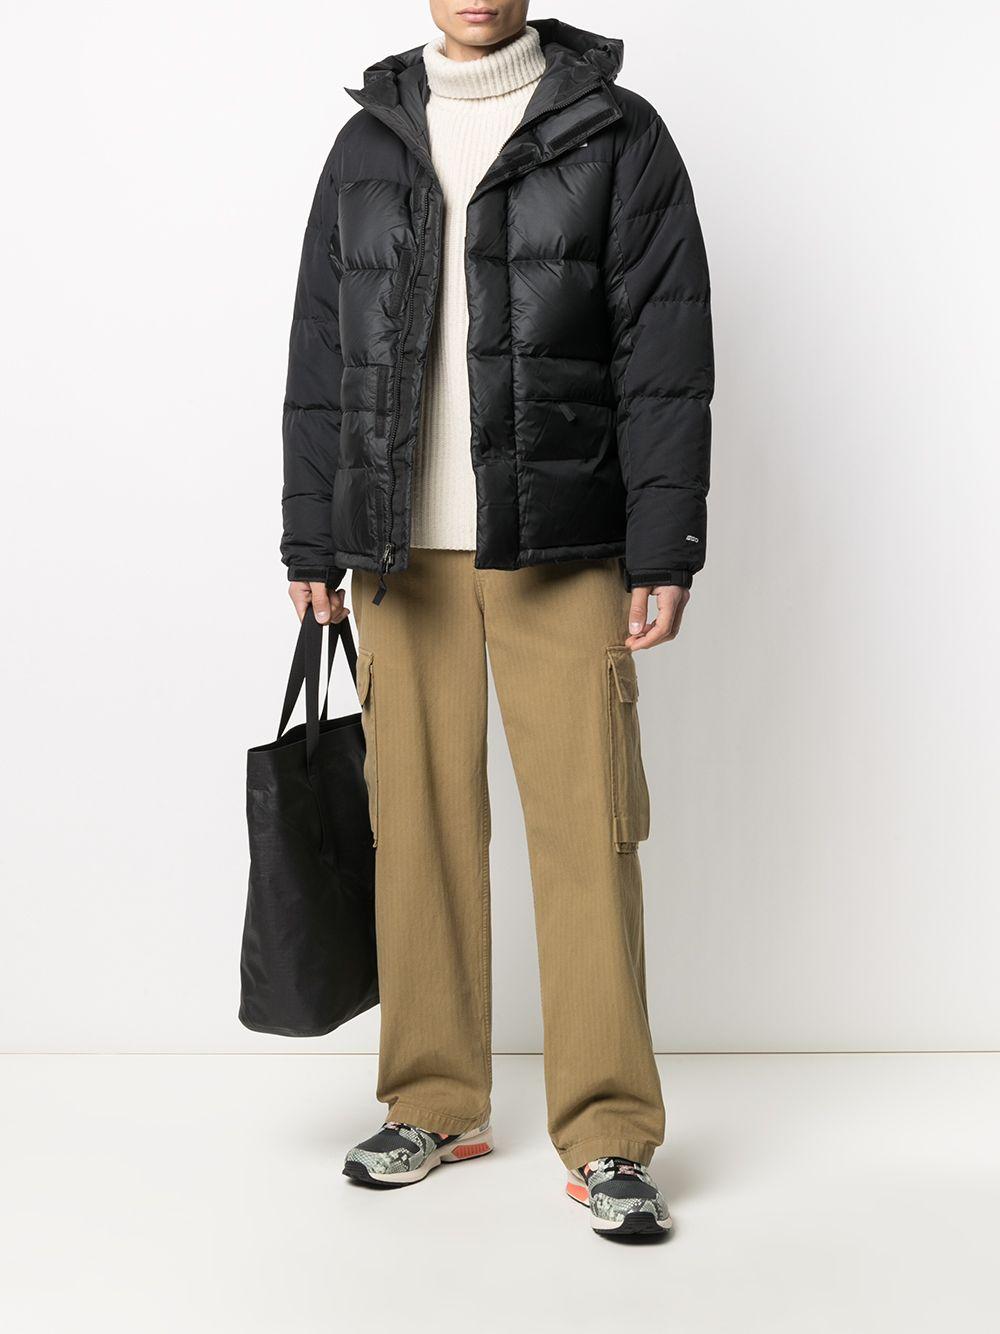 himalayan down jacket man black THE NORTH FACE | Jackets | NF0A4QYXJK31